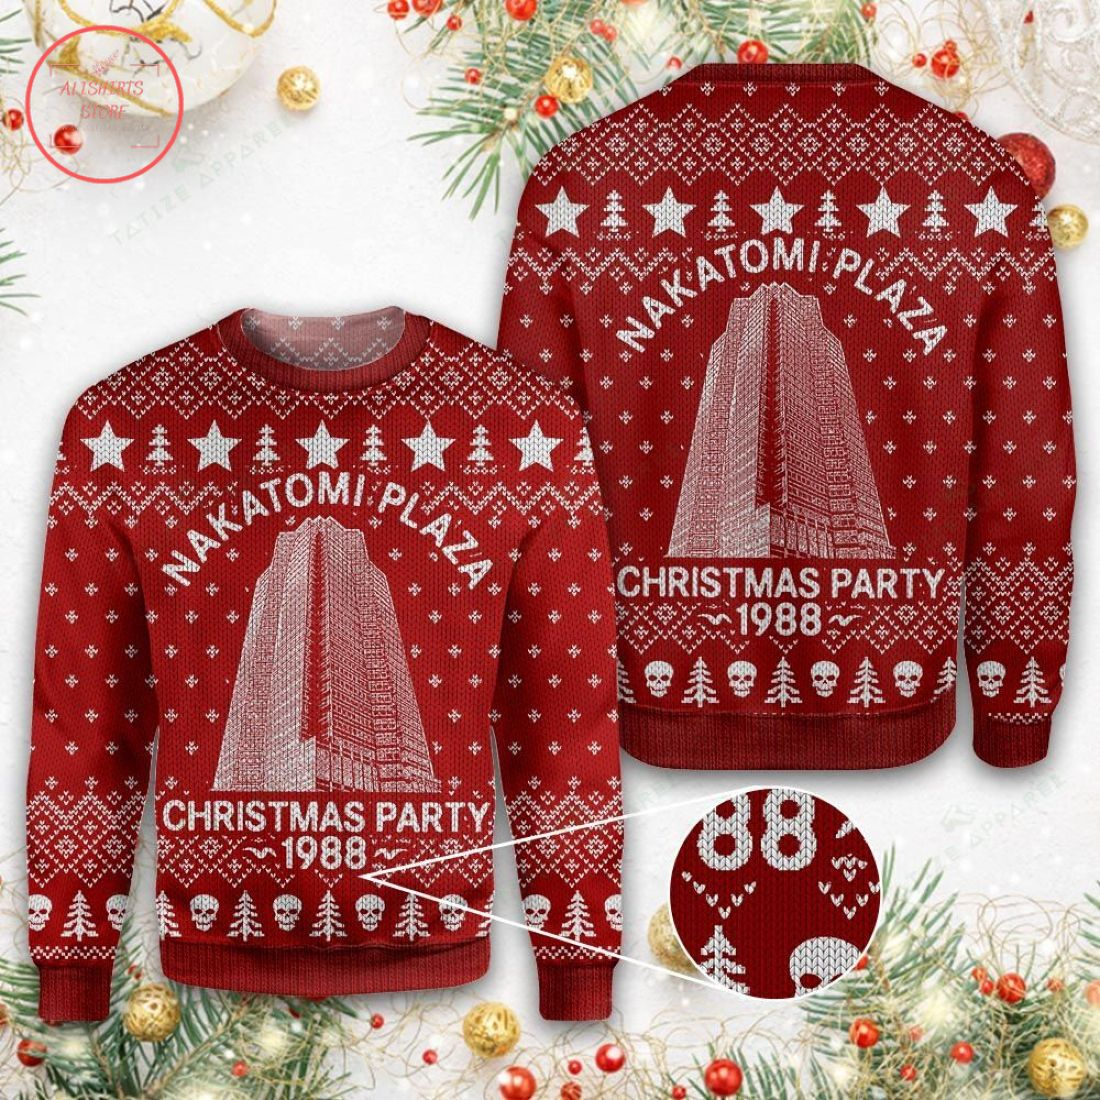 Nakatomi Plaza 1988 Christmas Sweater